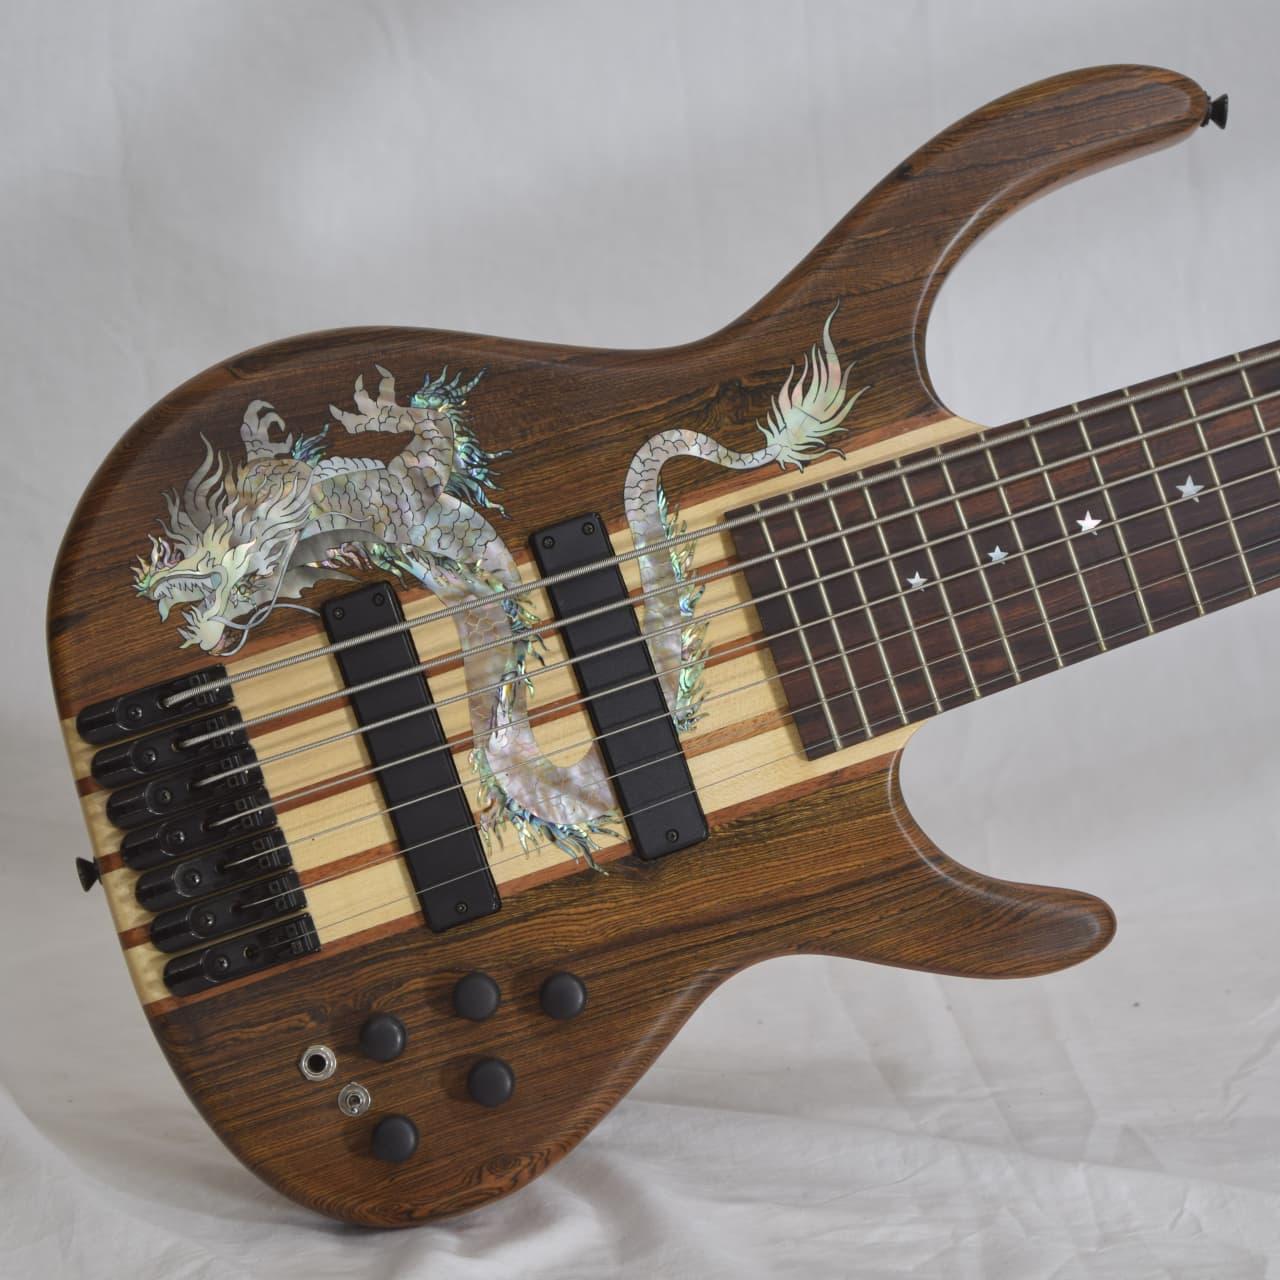 antonio tsai 7 string bass guitar 2016 mexico bocote abalone reverb. Black Bedroom Furniture Sets. Home Design Ideas